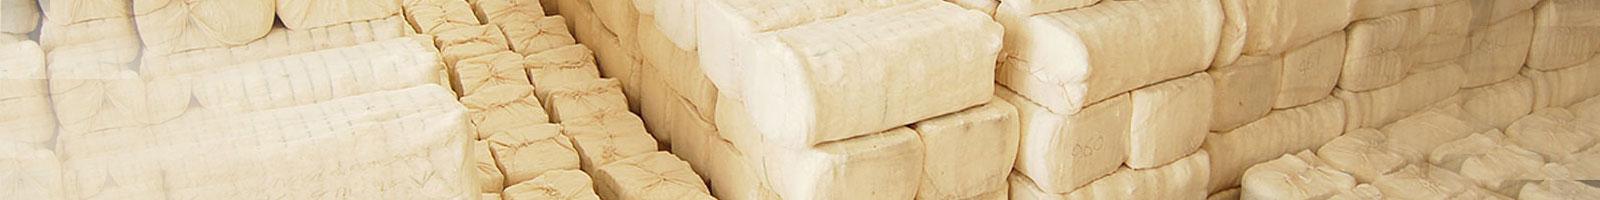 Cotton Bales of Matangi Cotton Industries | Indian Cotton